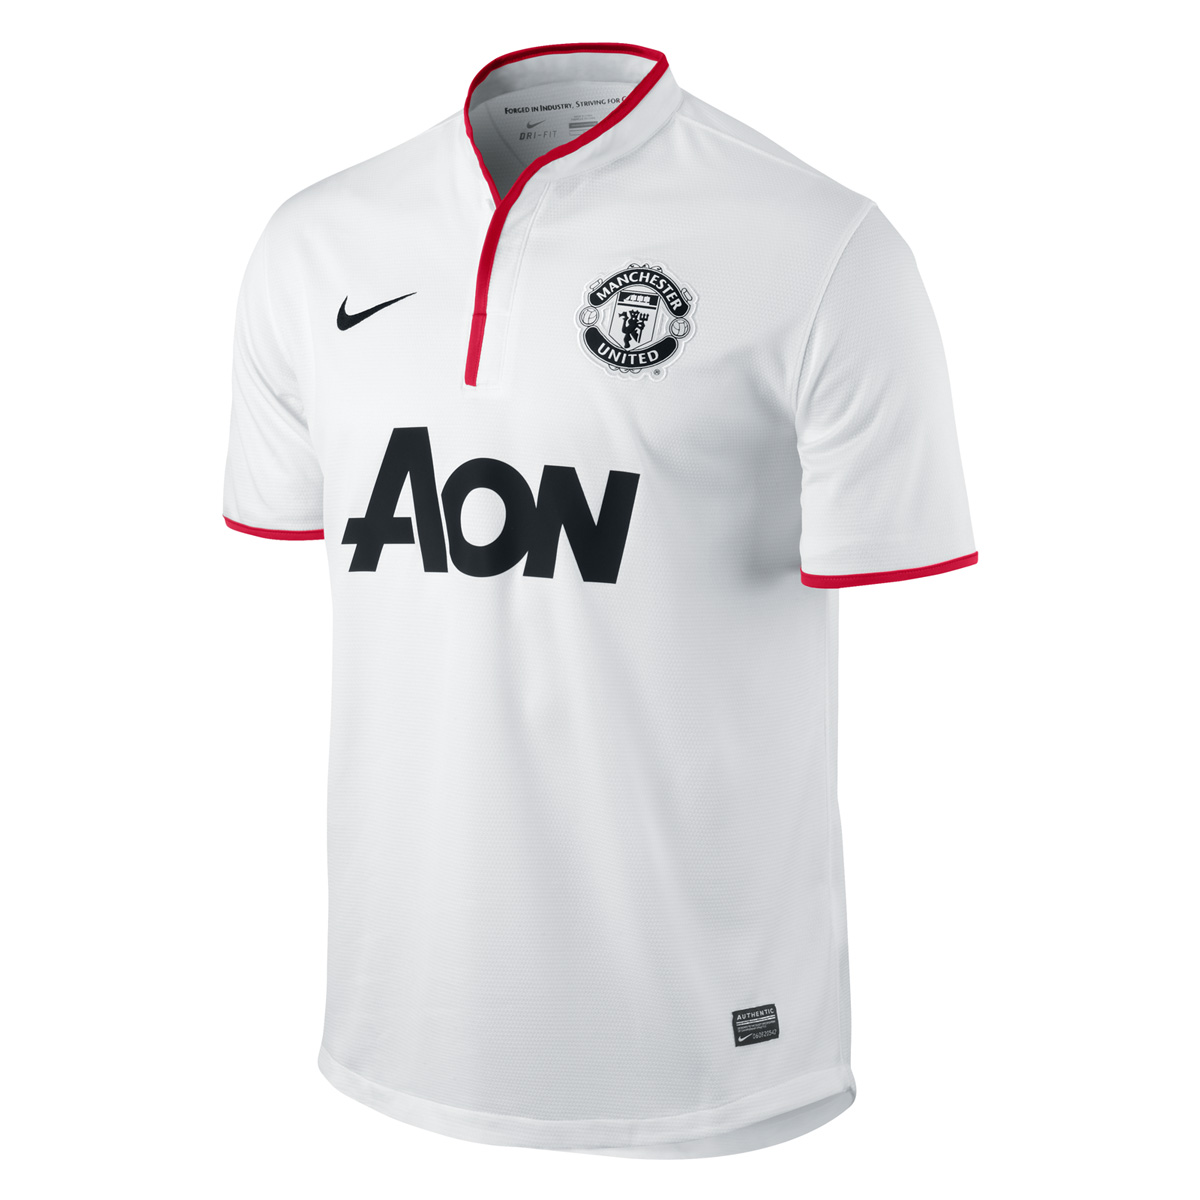 Manchester united white jersey 2013 filmai